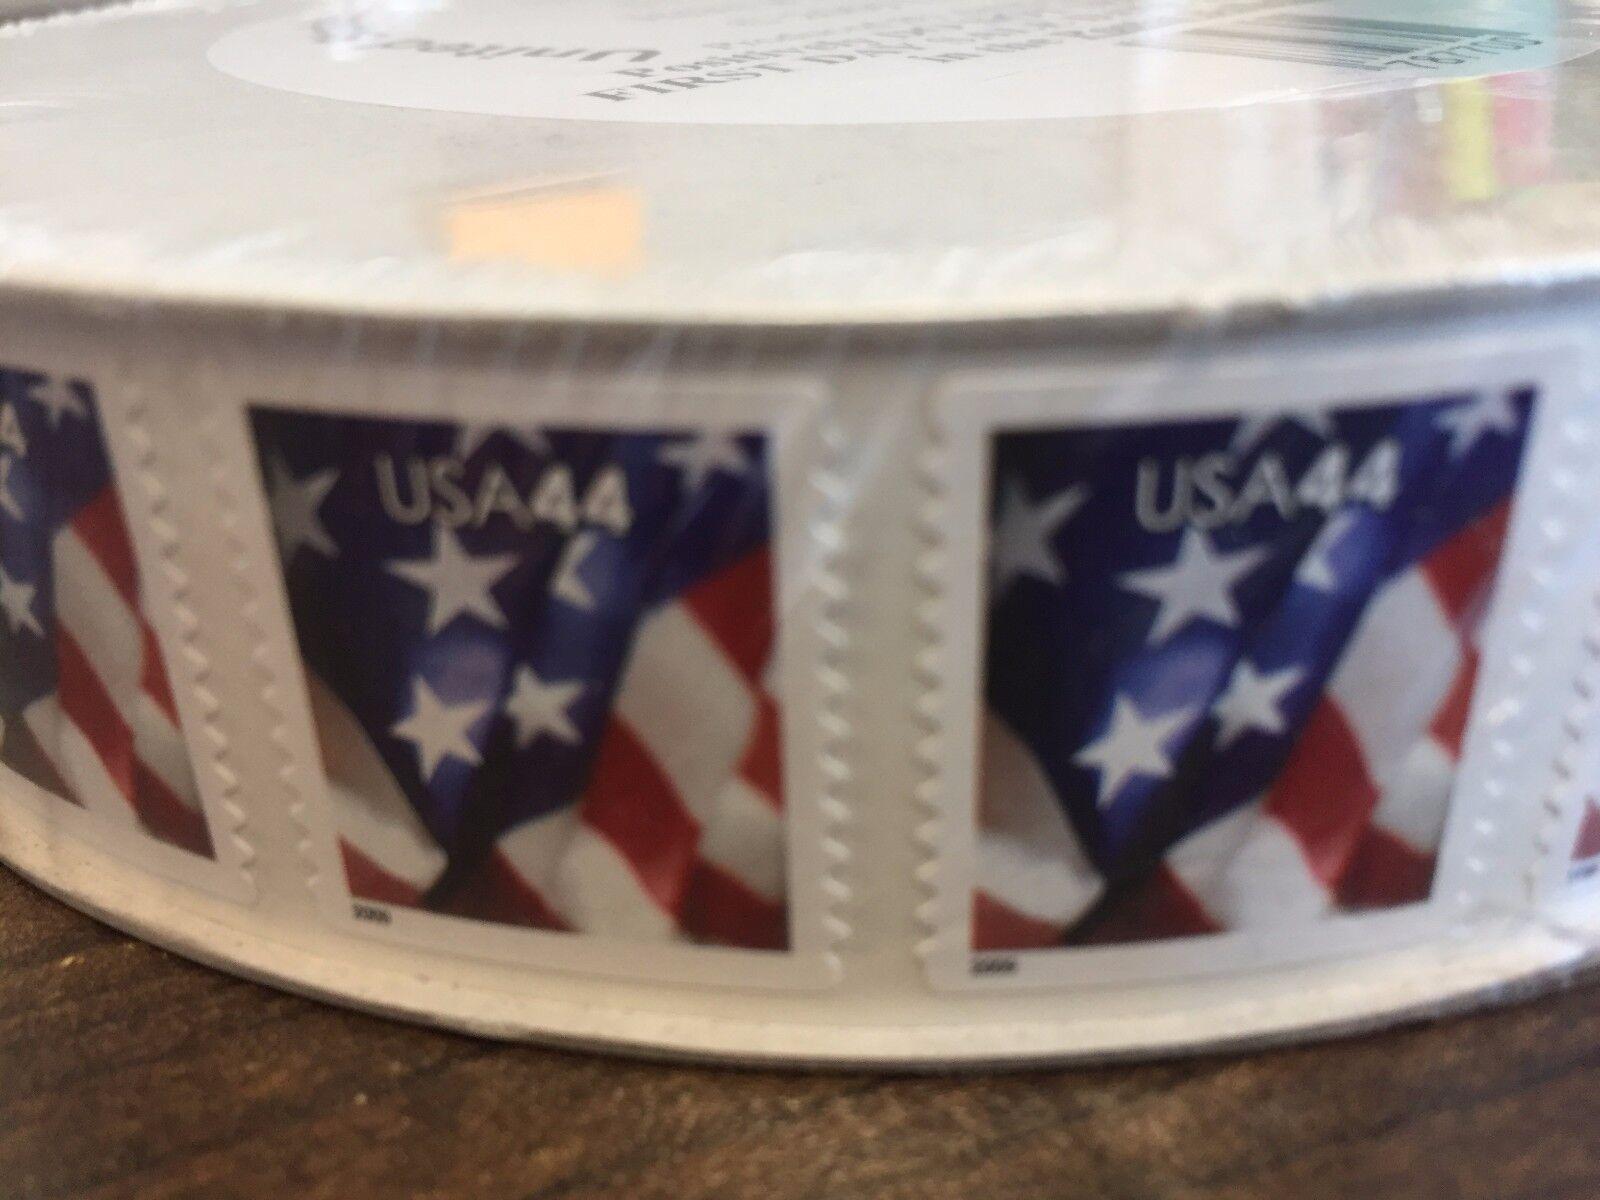 Изображение товара WCstamps: $1,320.00 Face Value - 1 Roll (3,000) 44c U.S. Stamps, LOT#2